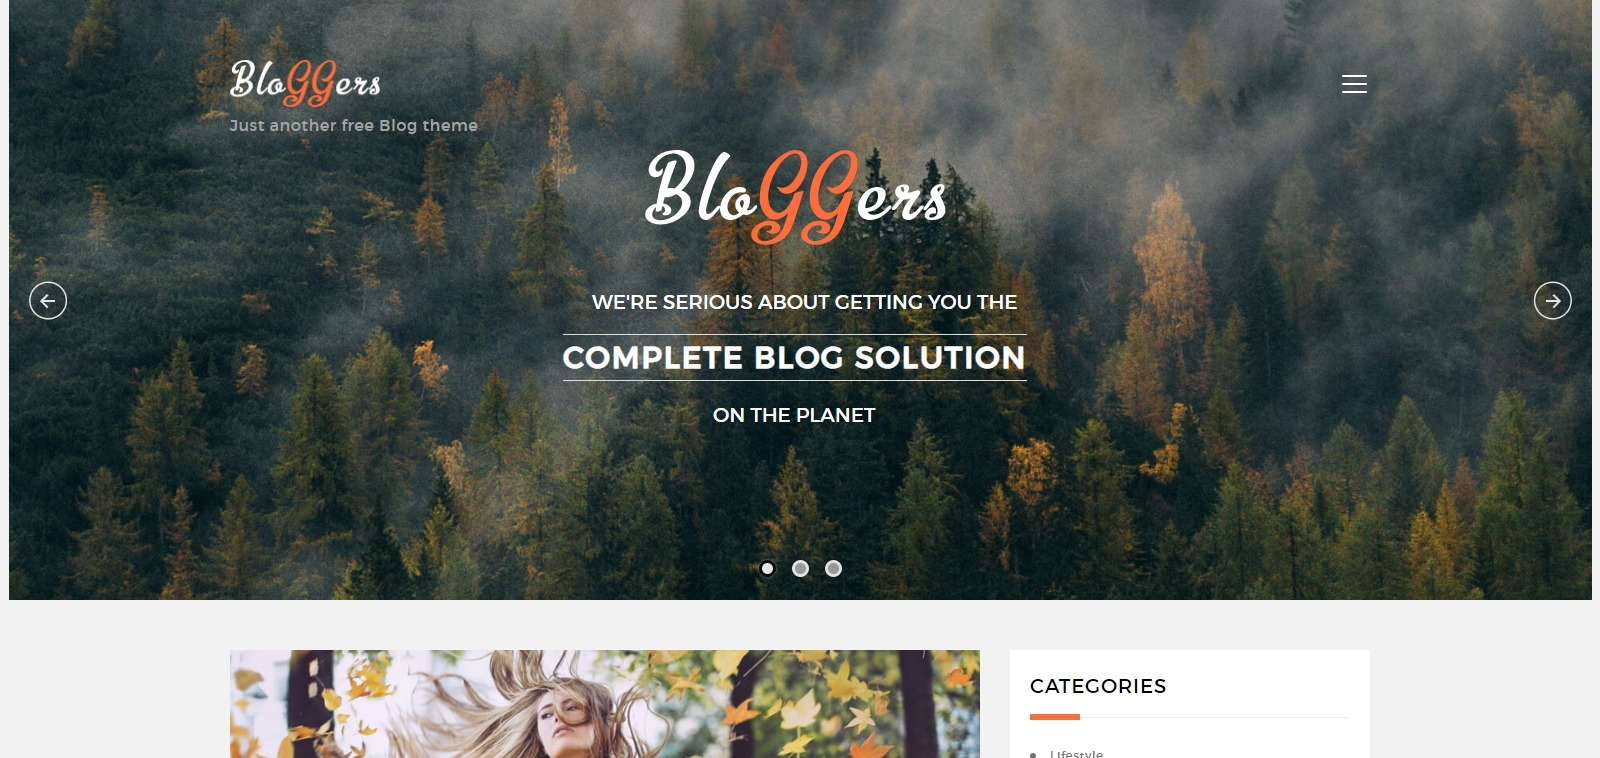 Bloggers-Header